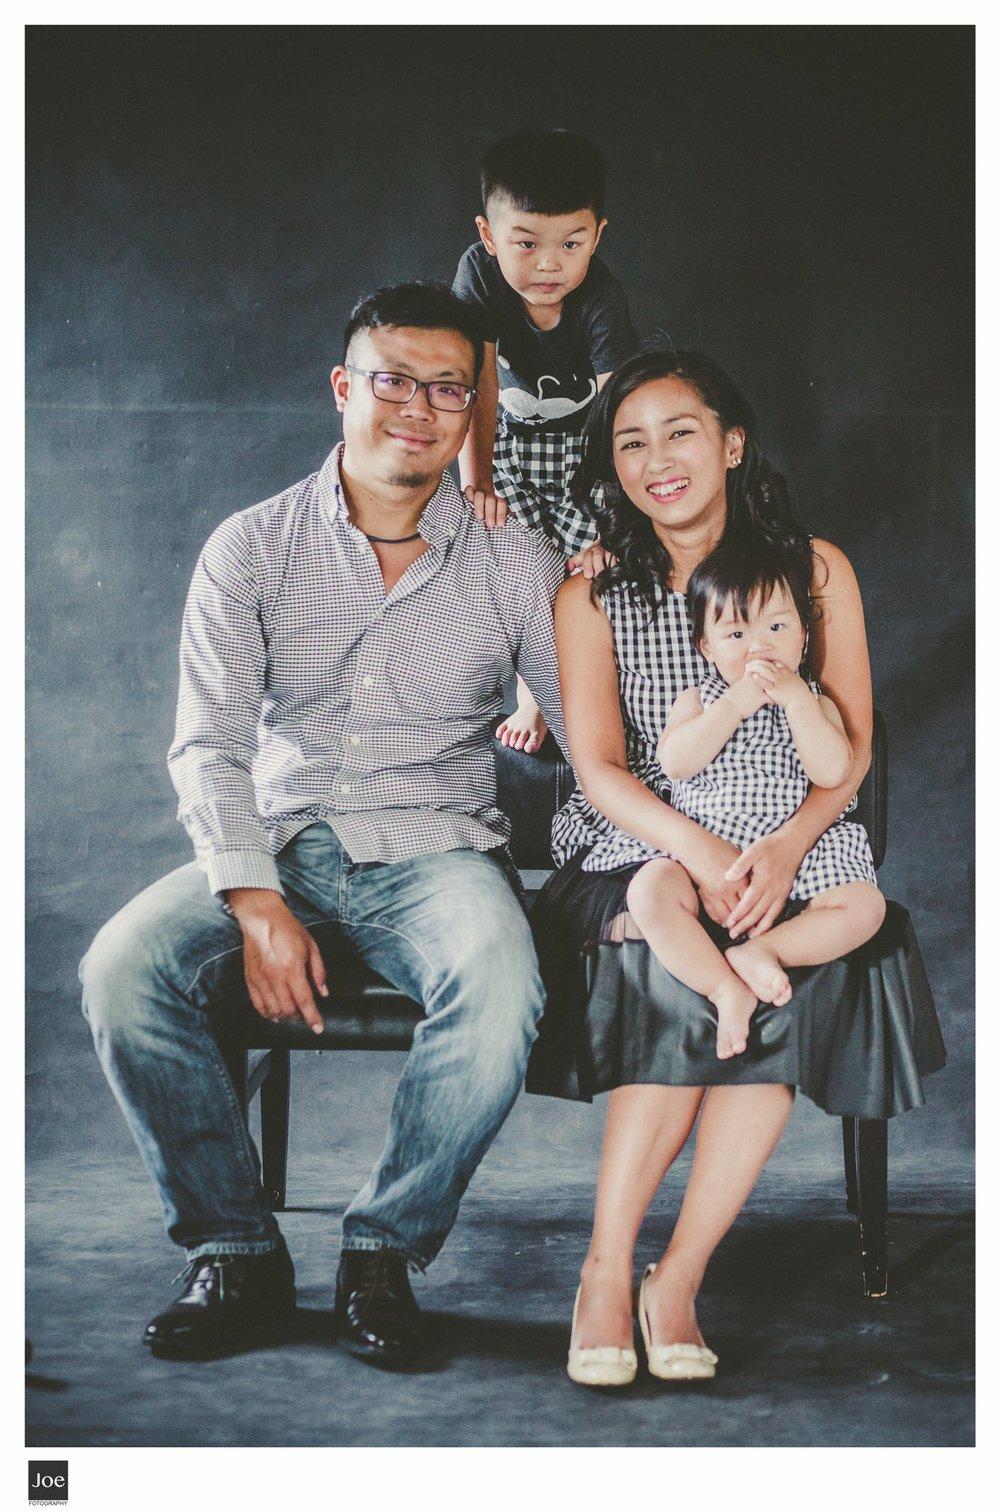 joe-fotography-family-photo-pepper-salt-bowtie-014.jpg